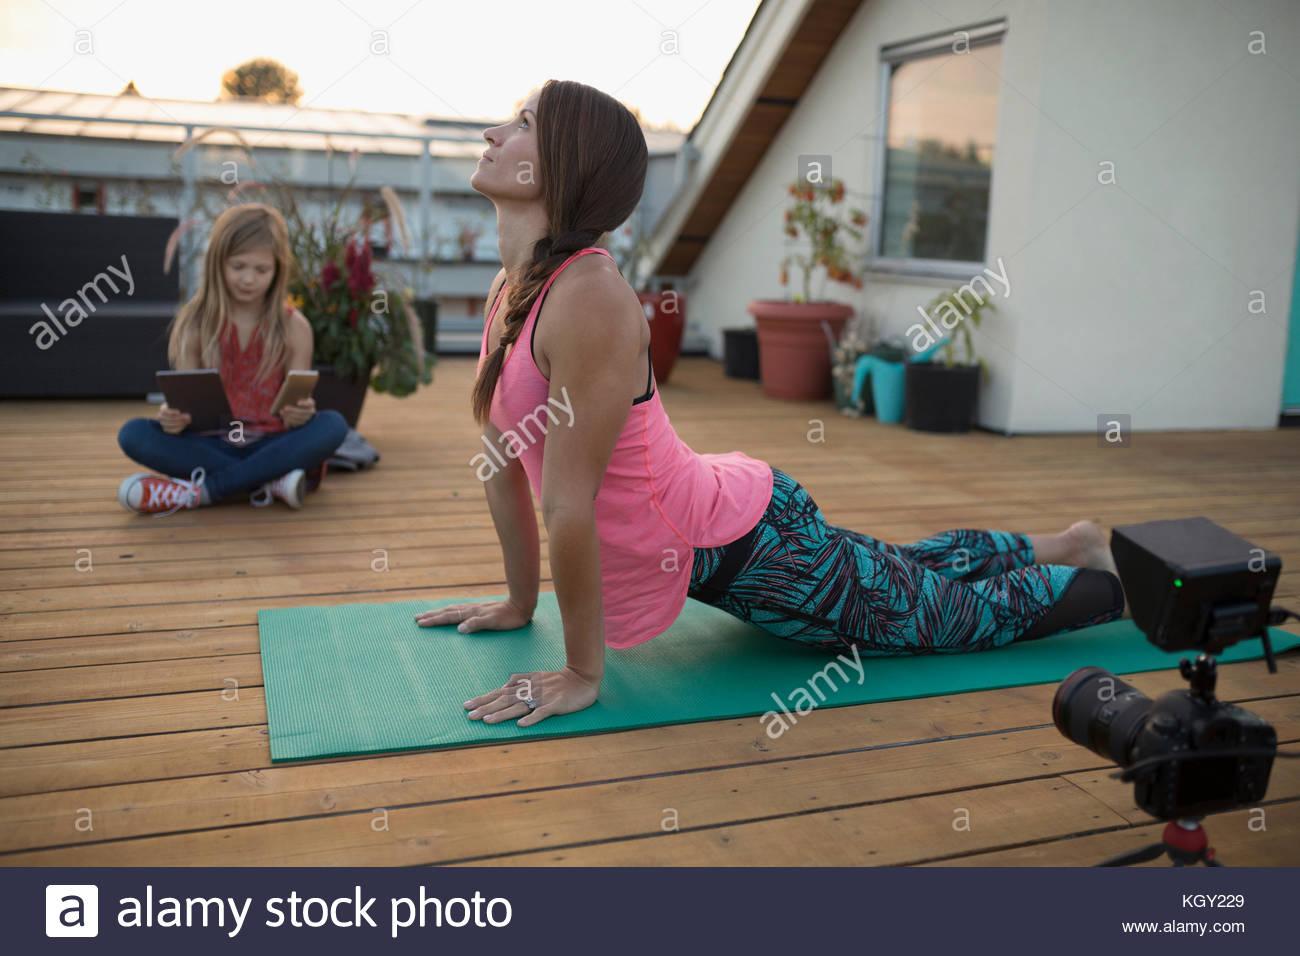 Female yoga instructor with video camera filming, vlogging upward facing dog yoga pose on patio deck - Stock Image